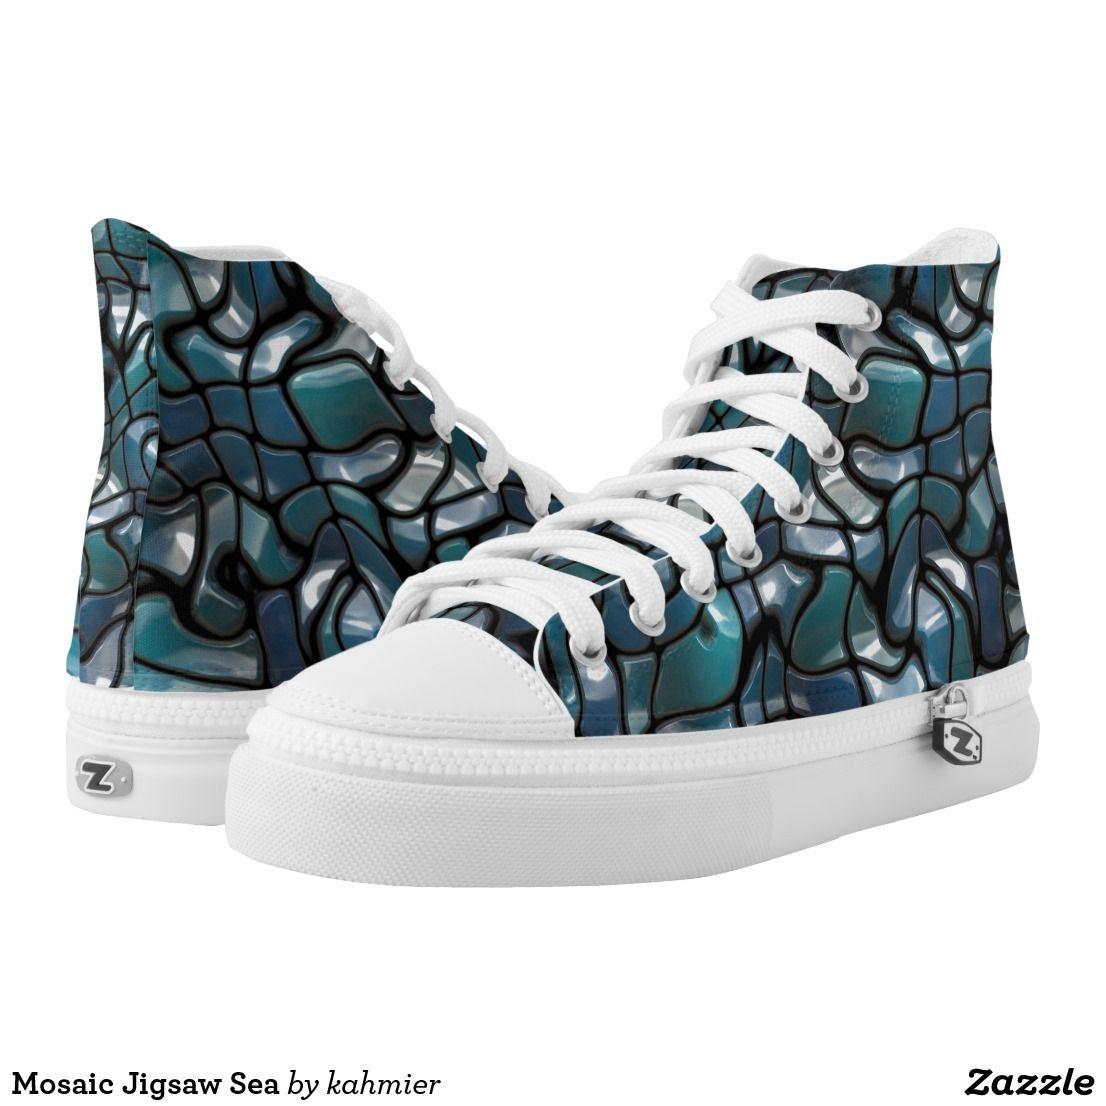 Mosaic jigsaw sea hightop sneakers high